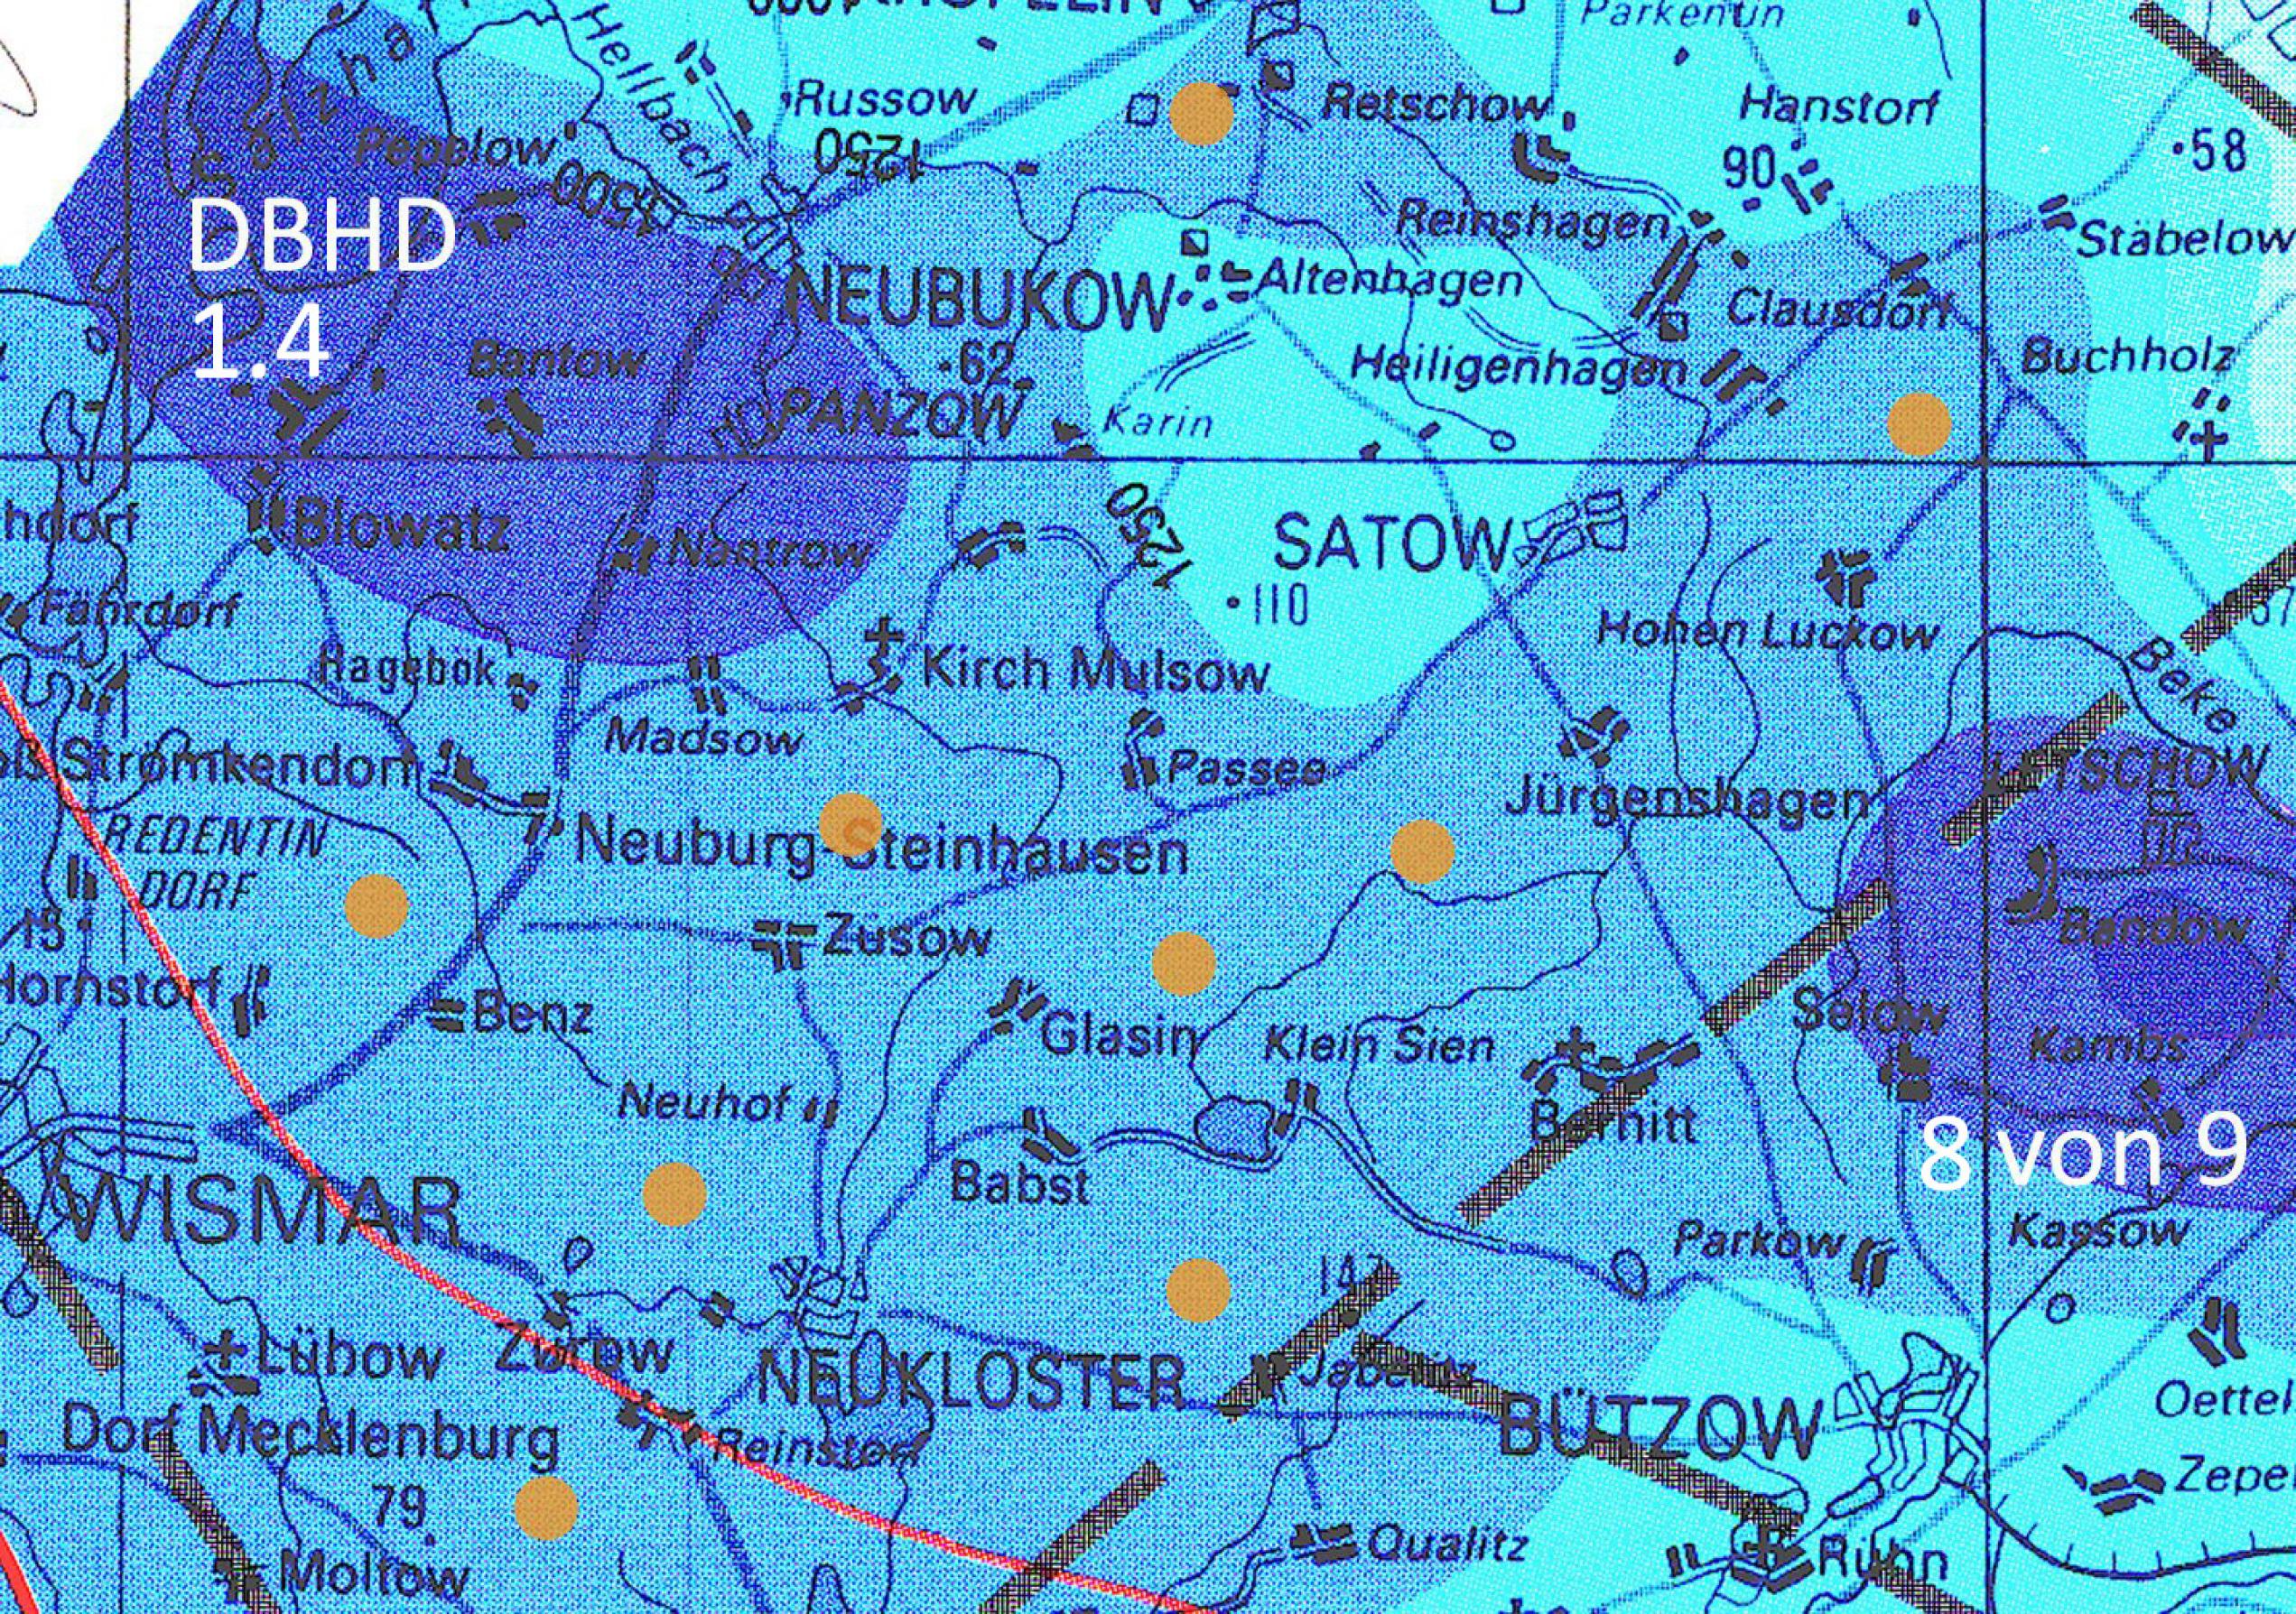 Geologische Karte Steinsalz DBHD Endlager Volker Goebel Endlager